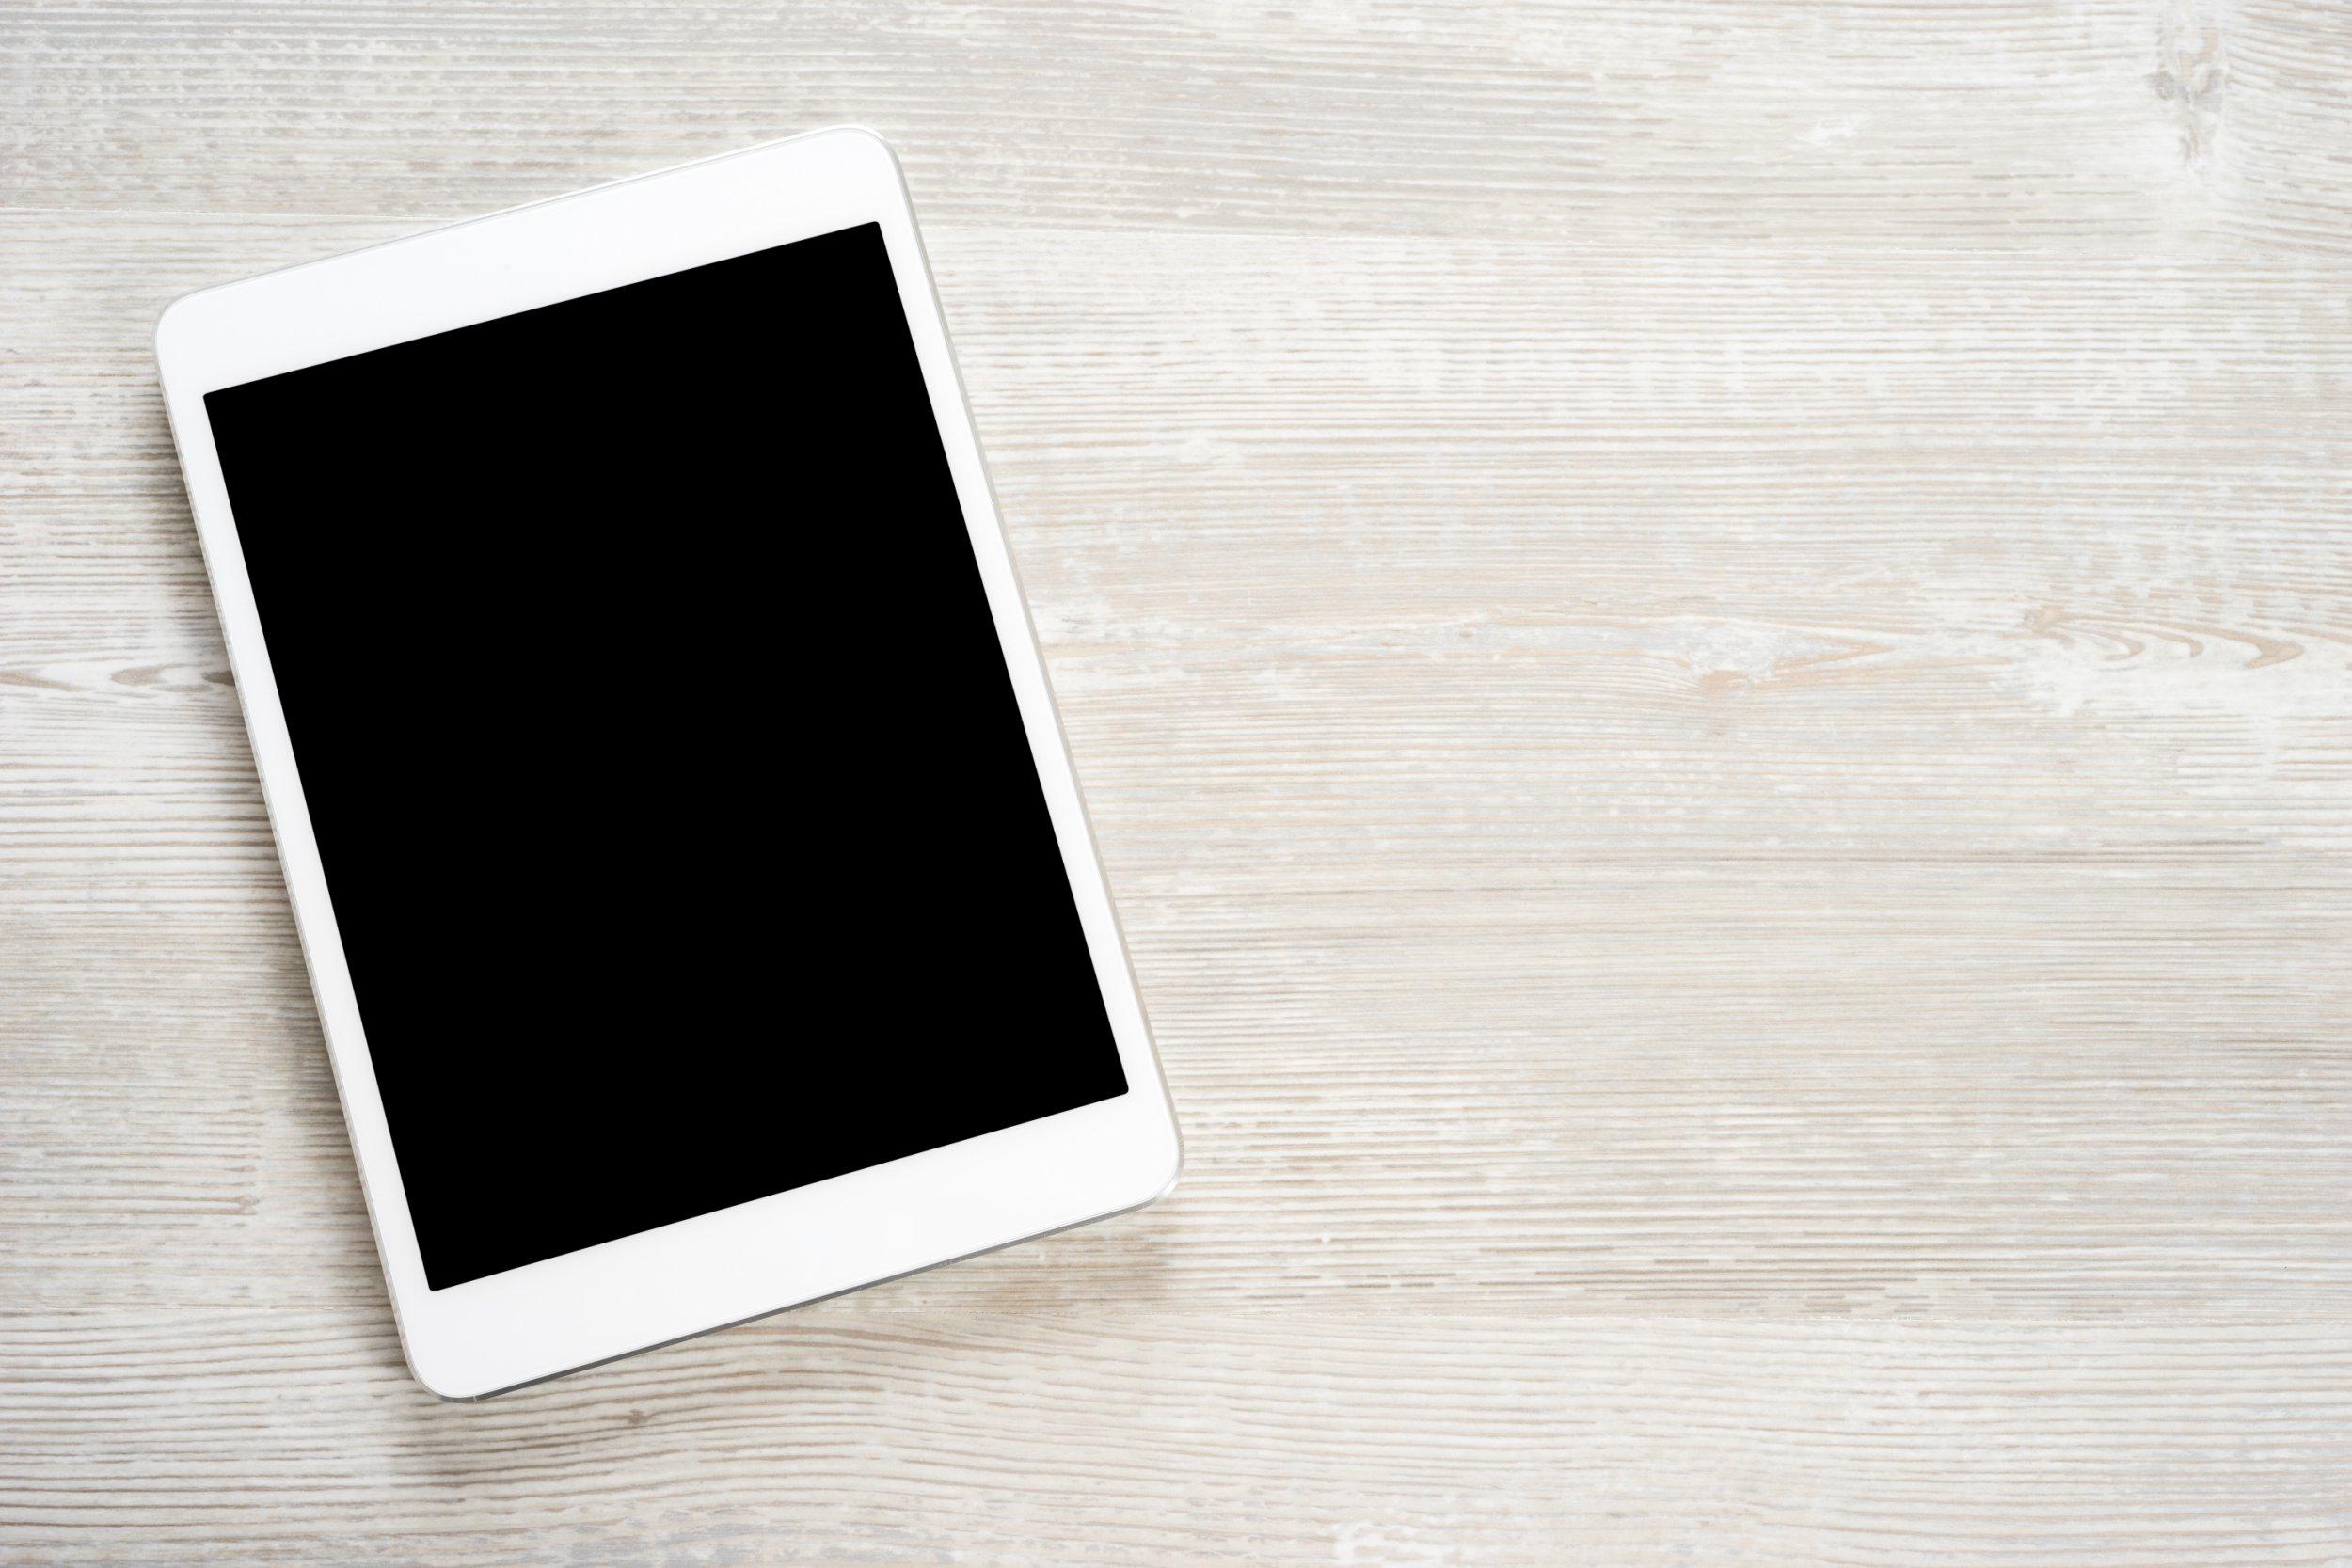 White digital tablet on wooden table